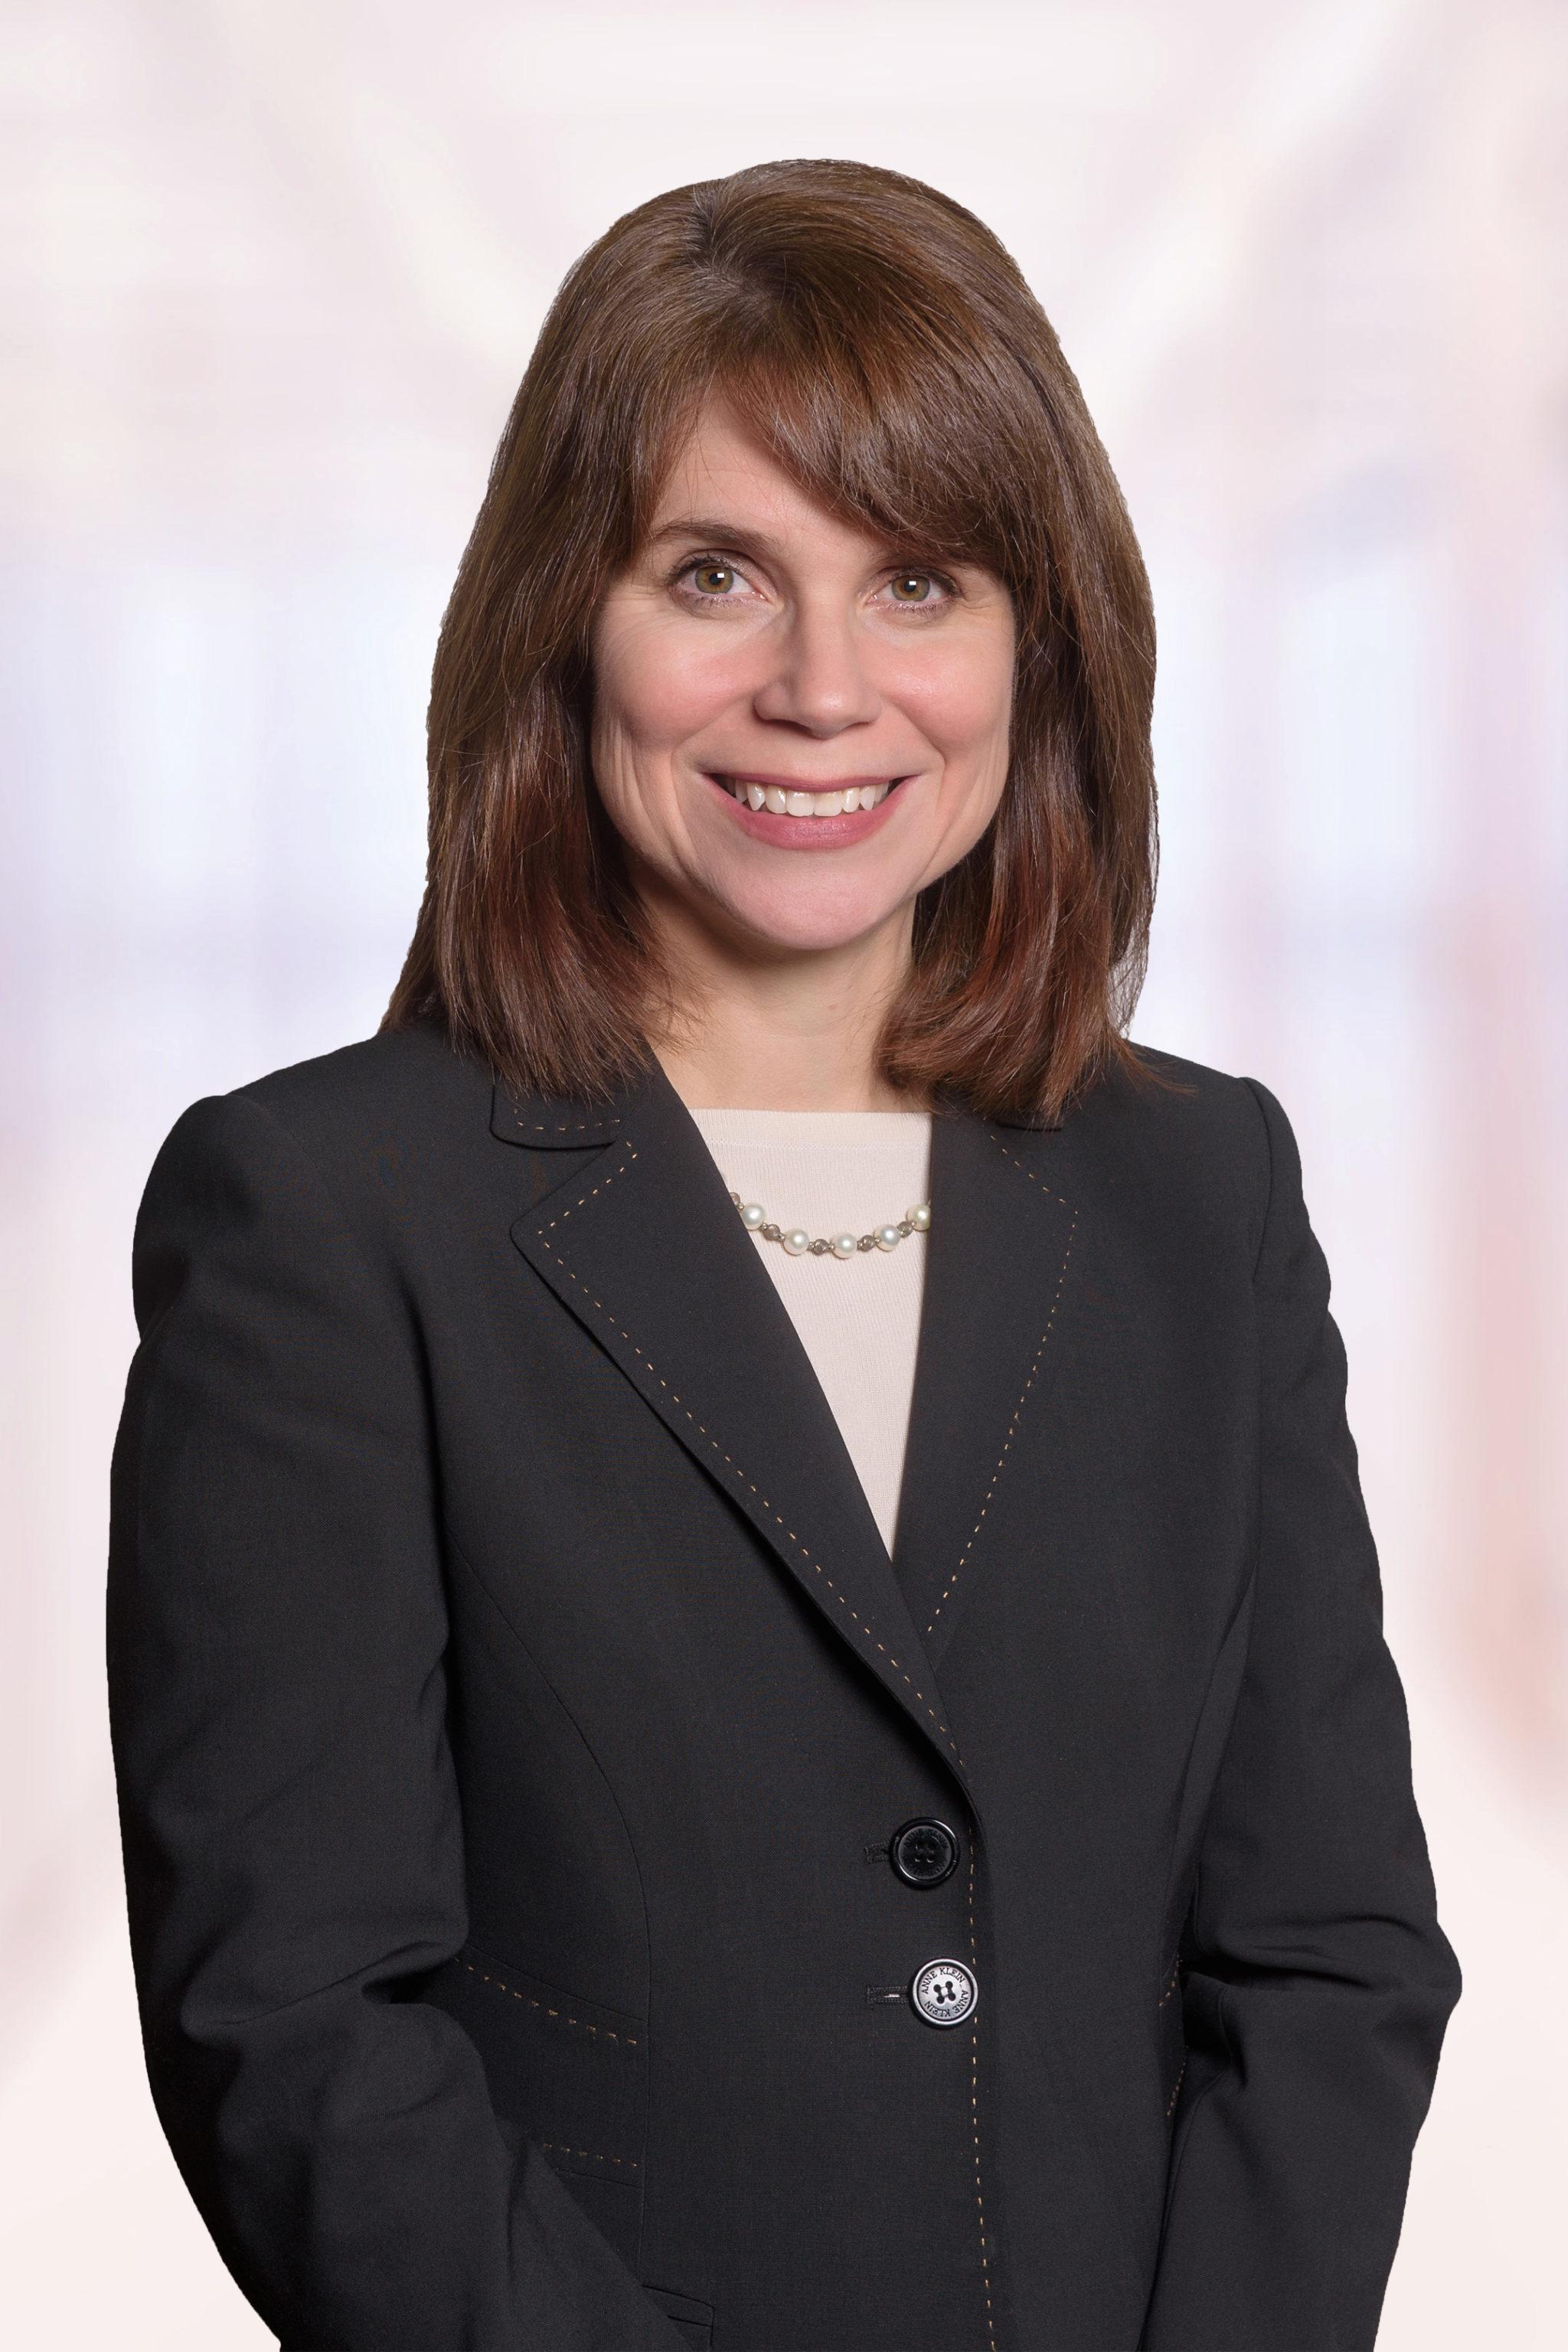 Anne Marie Jackson